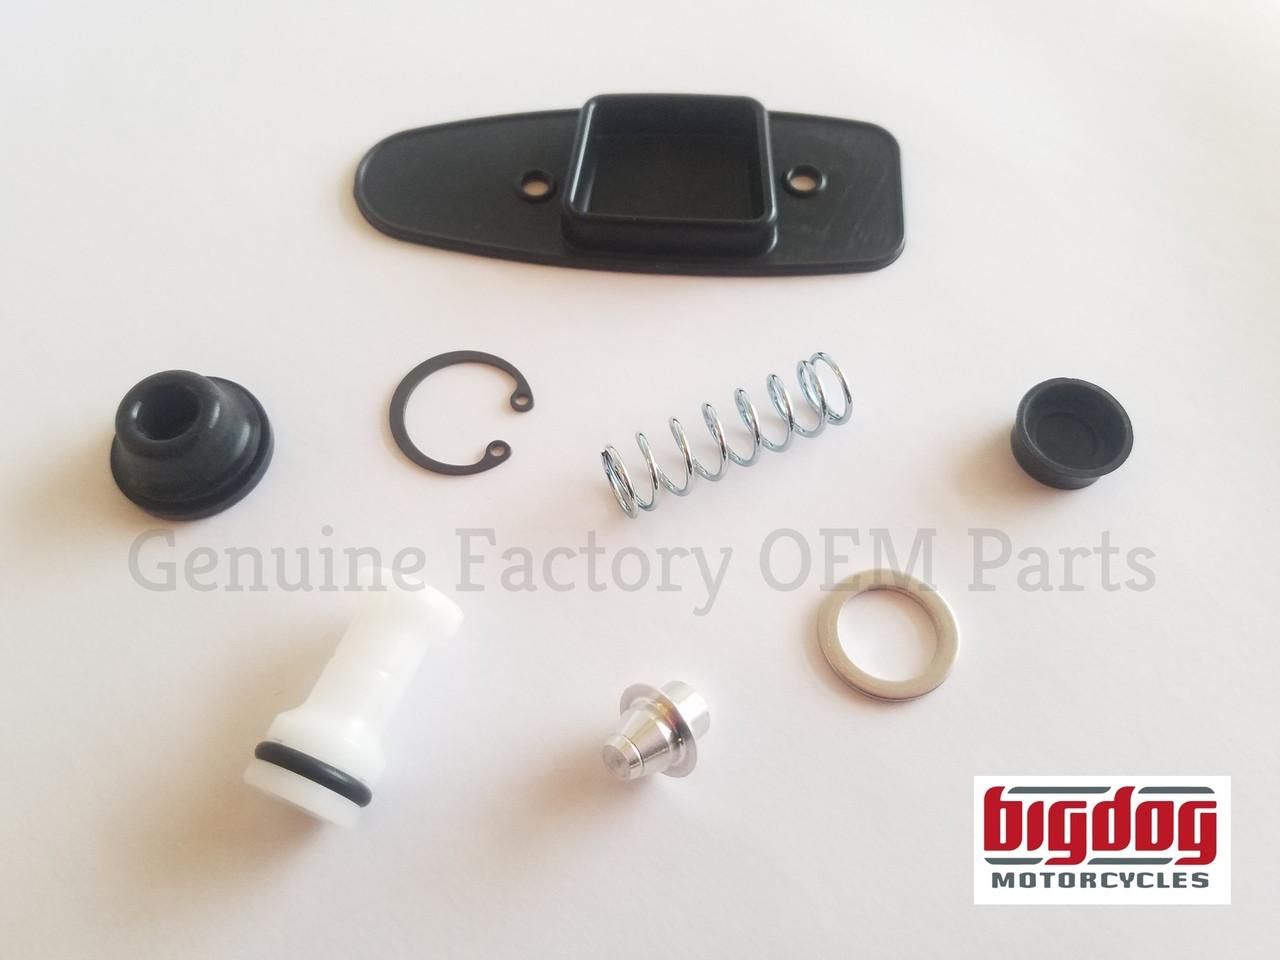 Parts w/Pads Big Dog Motorcycles Front/Rear Caliper Rebuild Master ...